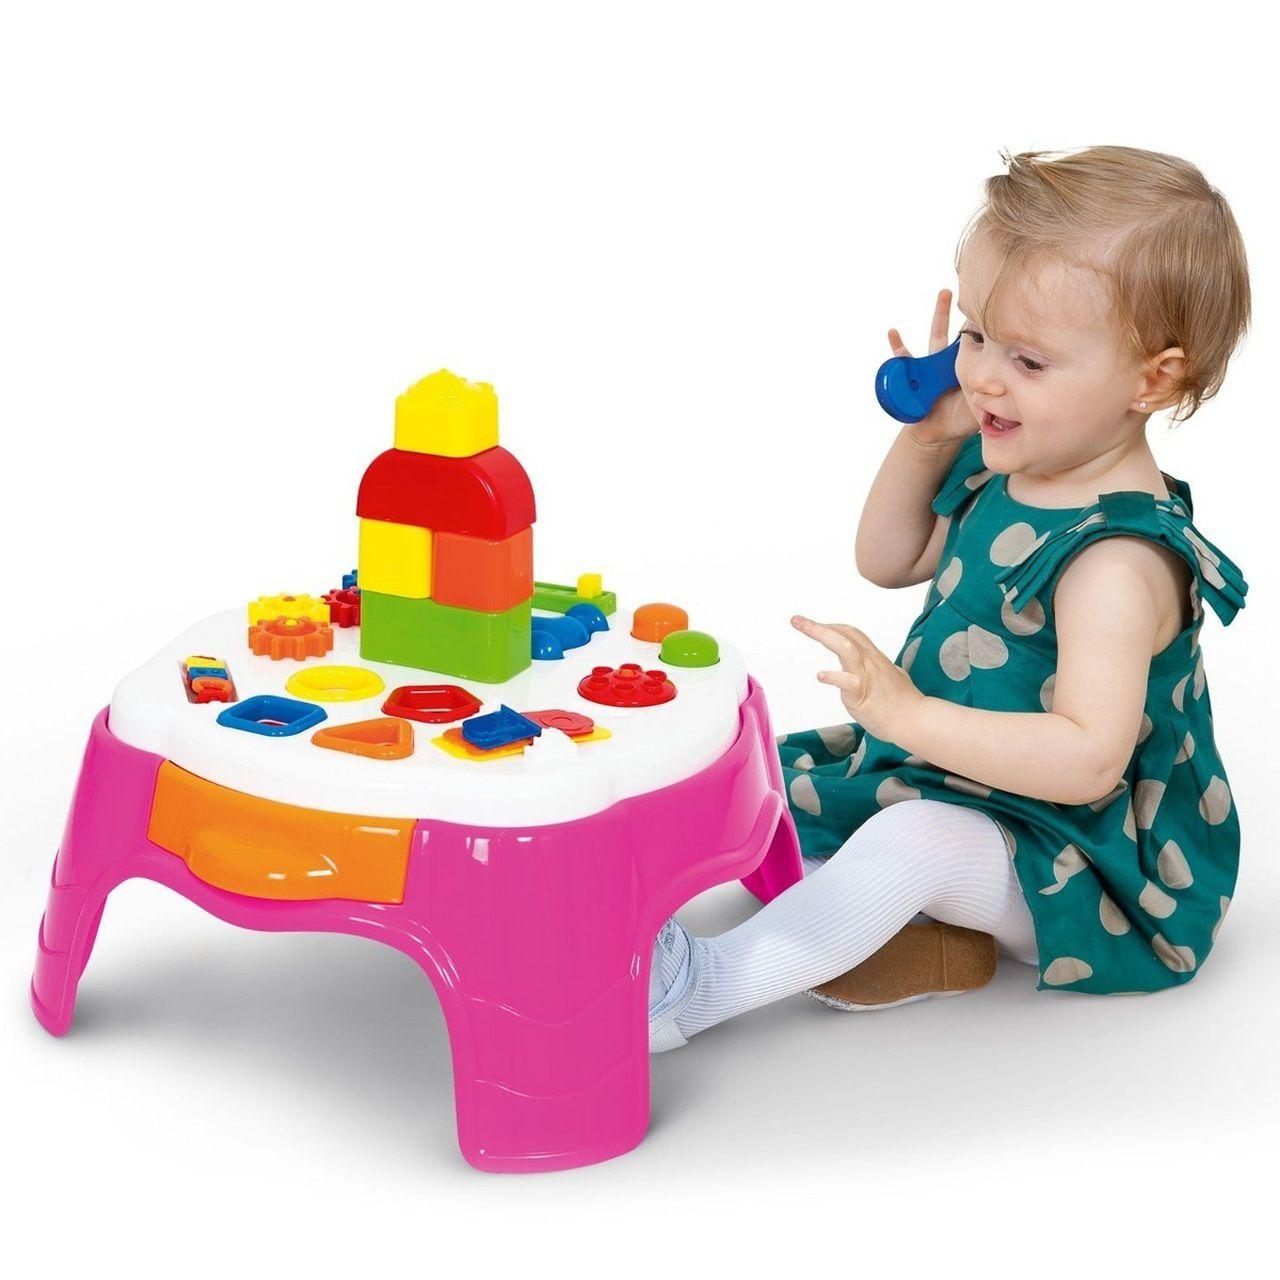 Mesinha de Atividades Infantil Play Time Rosa Cotiplás 2049